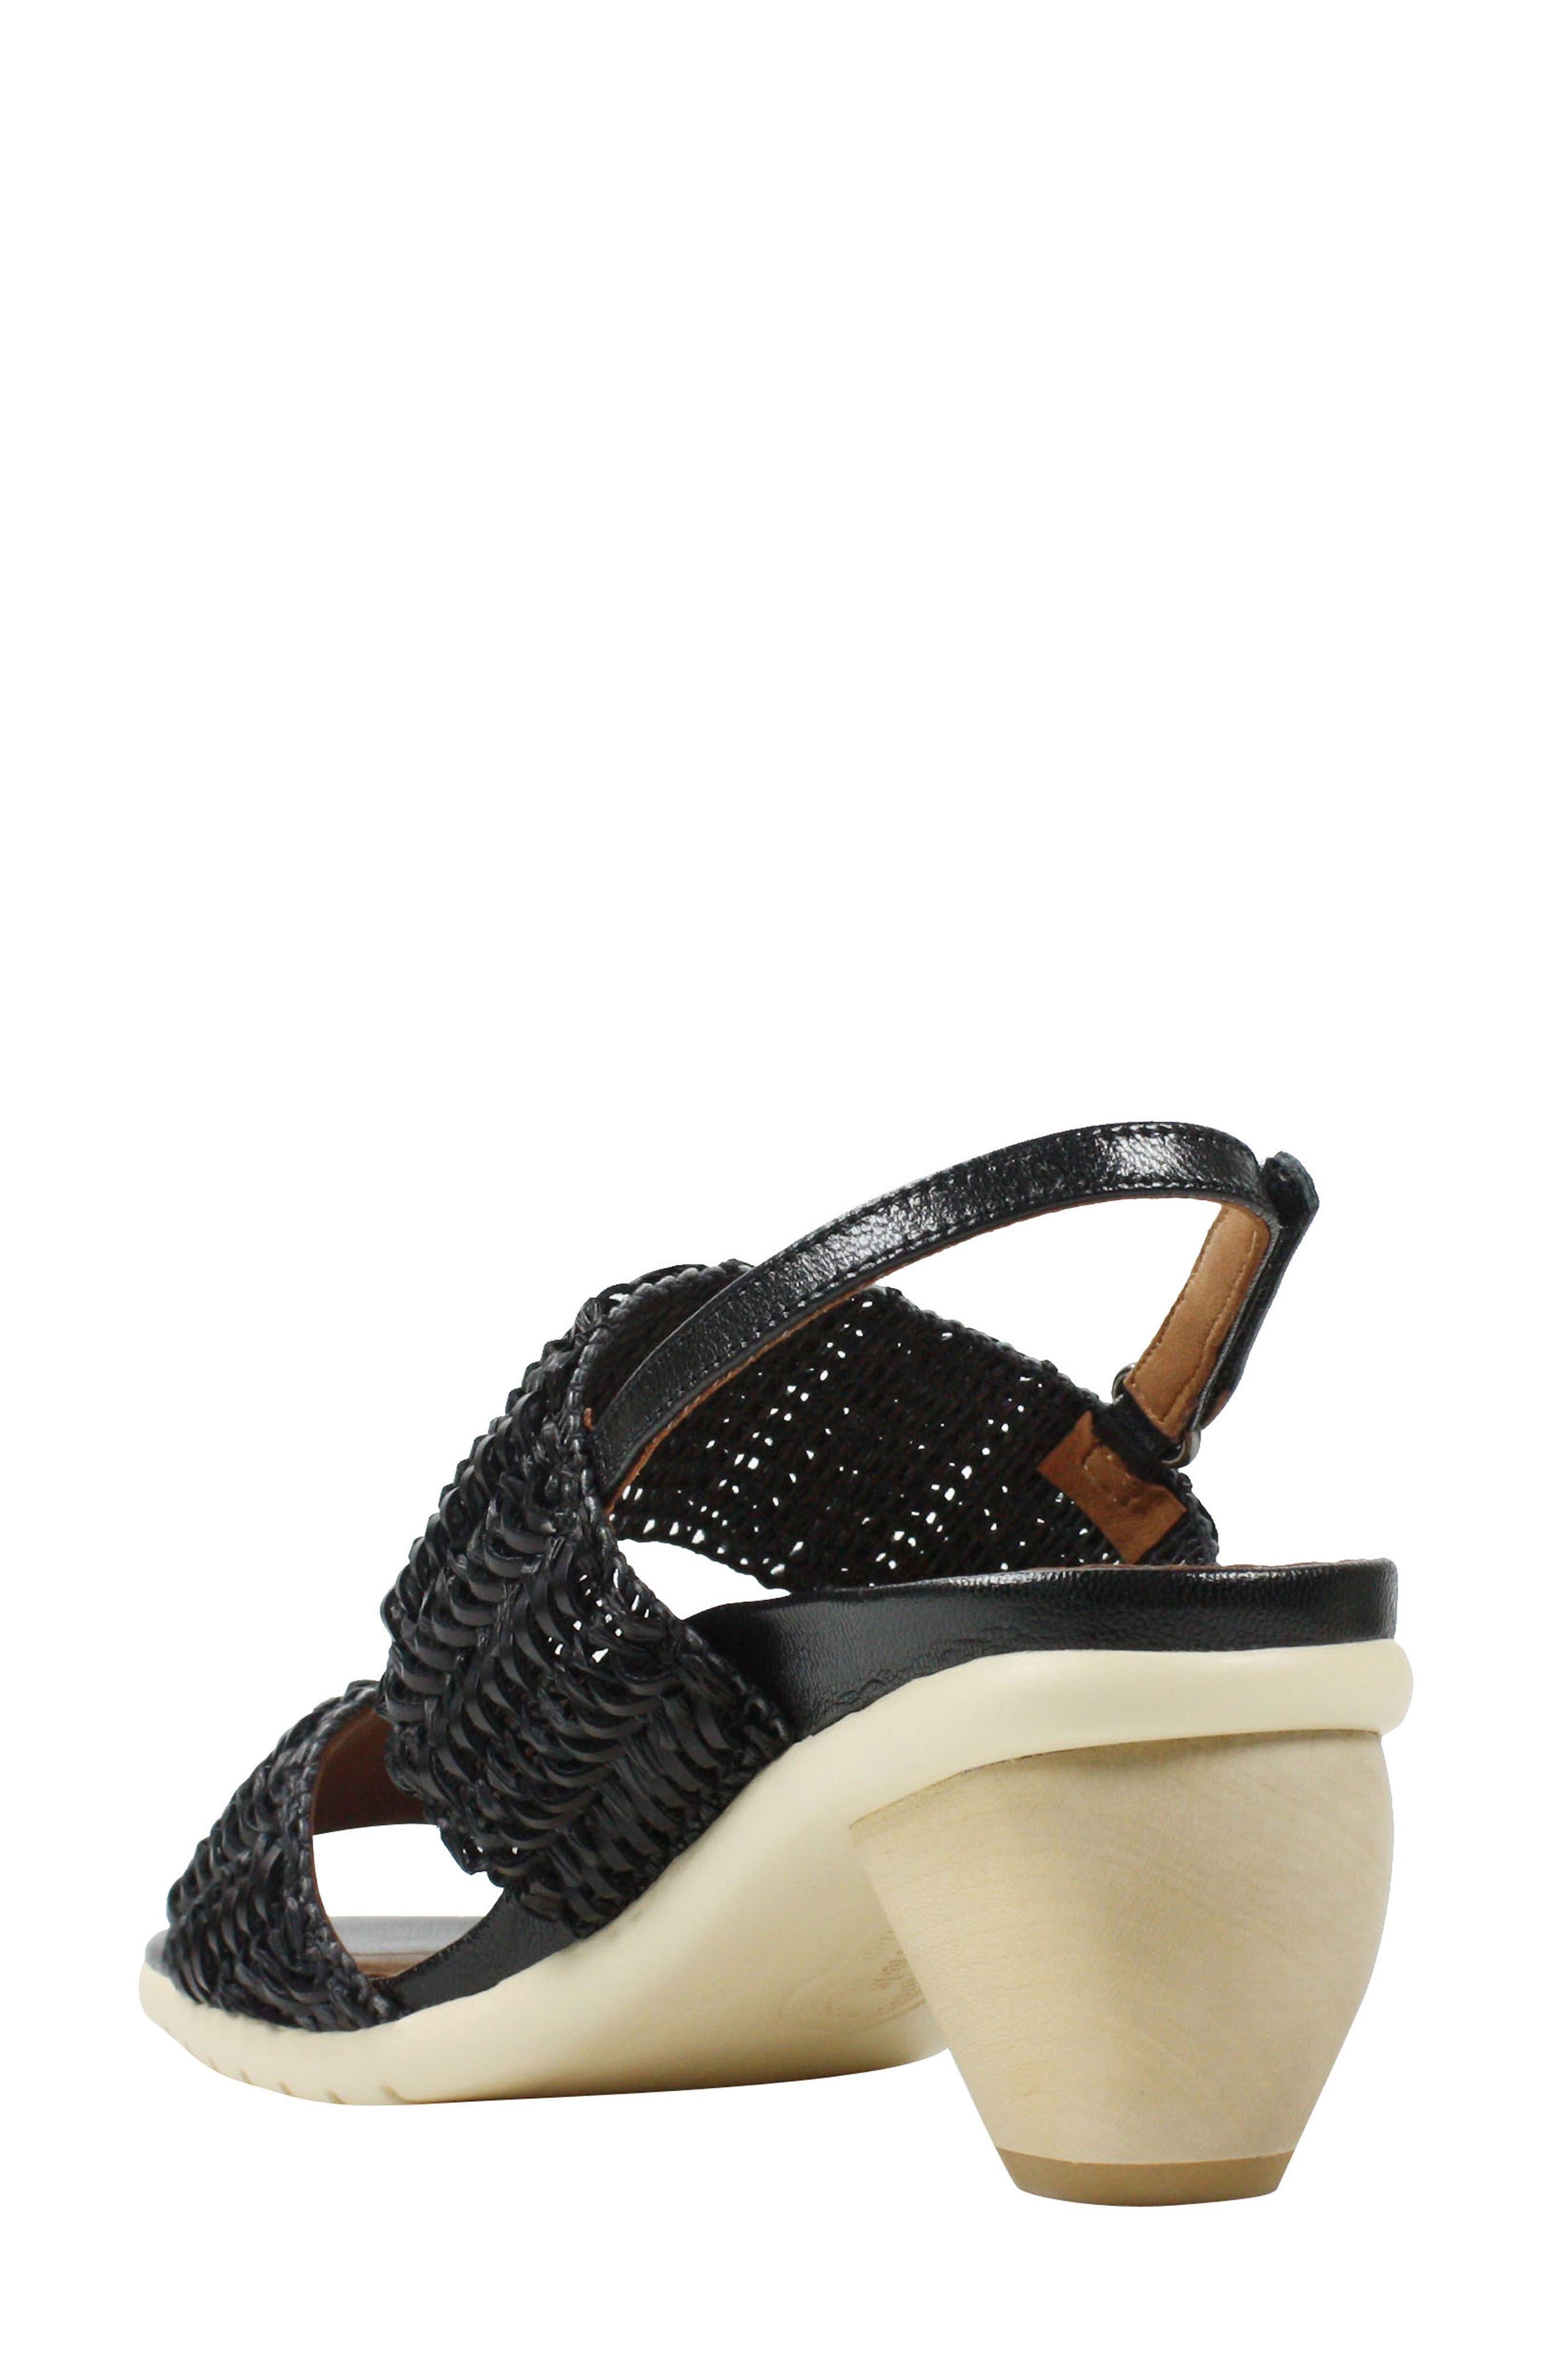 Ulrica Sandal,                             Alternate thumbnail 2, color,                             Black Fabric